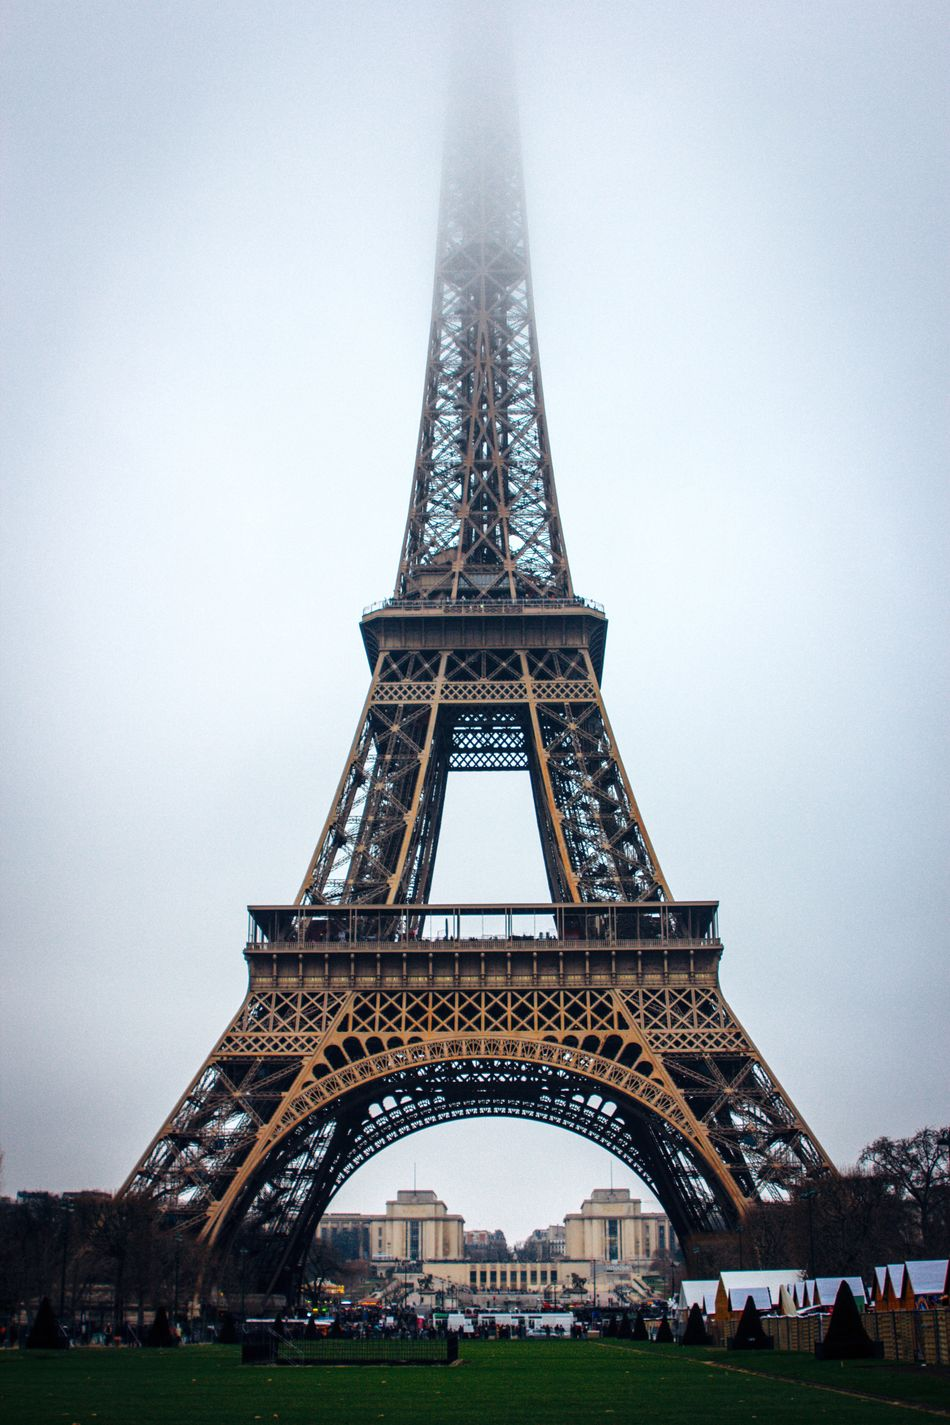 Architecture Cultures Travel Destinations Built Structure Foggy Morning Tower Tour Eiffel Paris, France  Paris EyeEm Karpetsphoto 2017 EyeEm Best Shots EyeEmBestEdits BestEyeemShots Streets City Life France Lifestyles